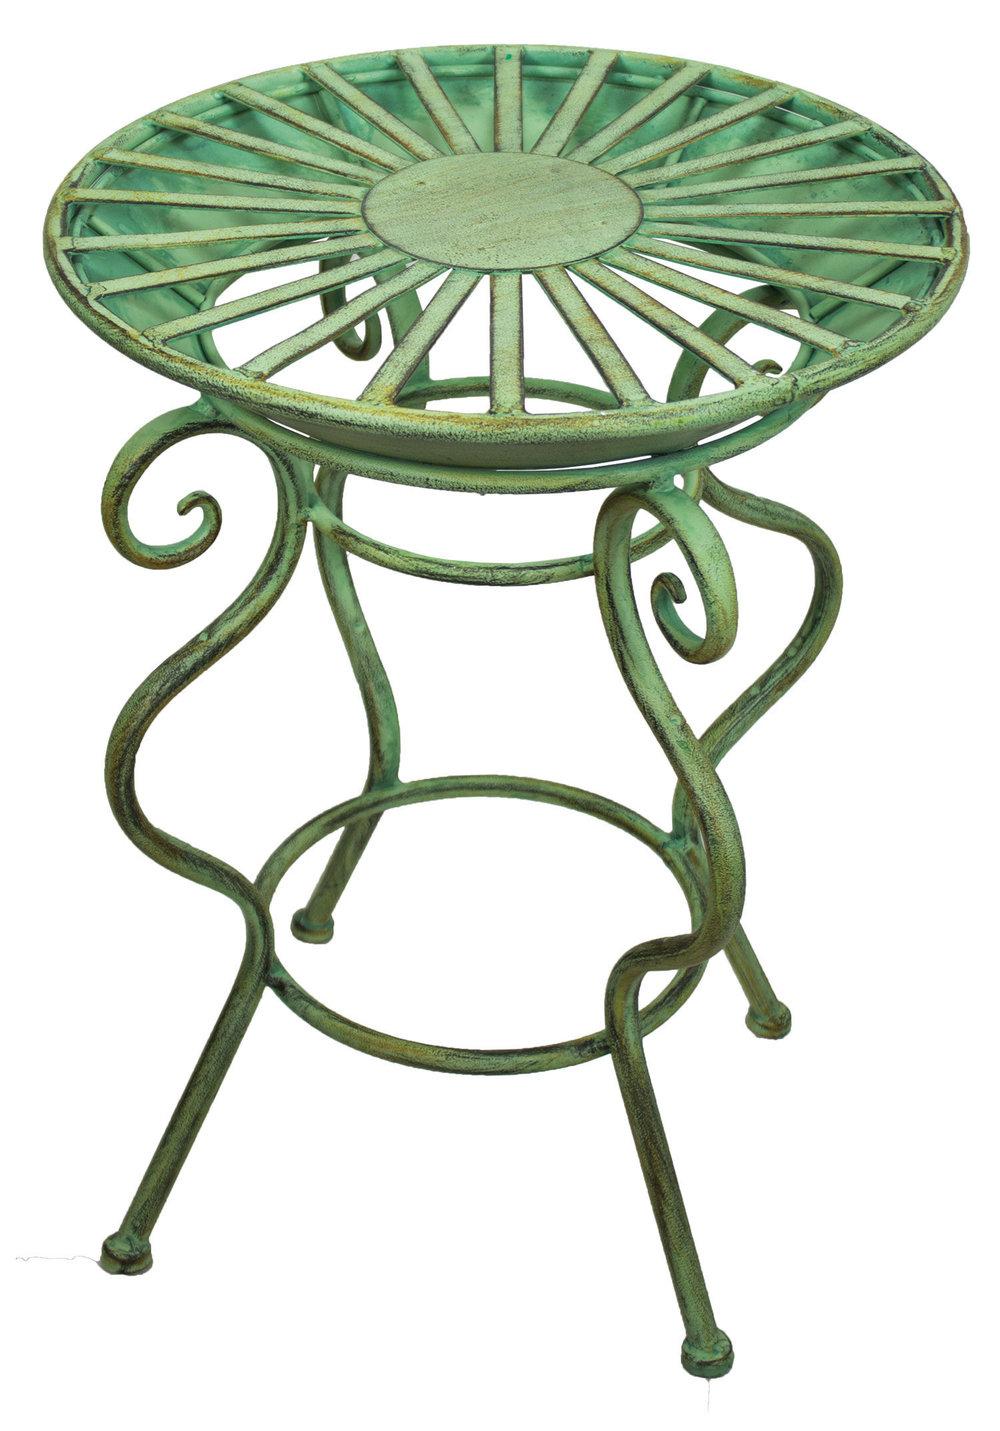 iron-table-garden-verdigris-museum-outlets.jpg